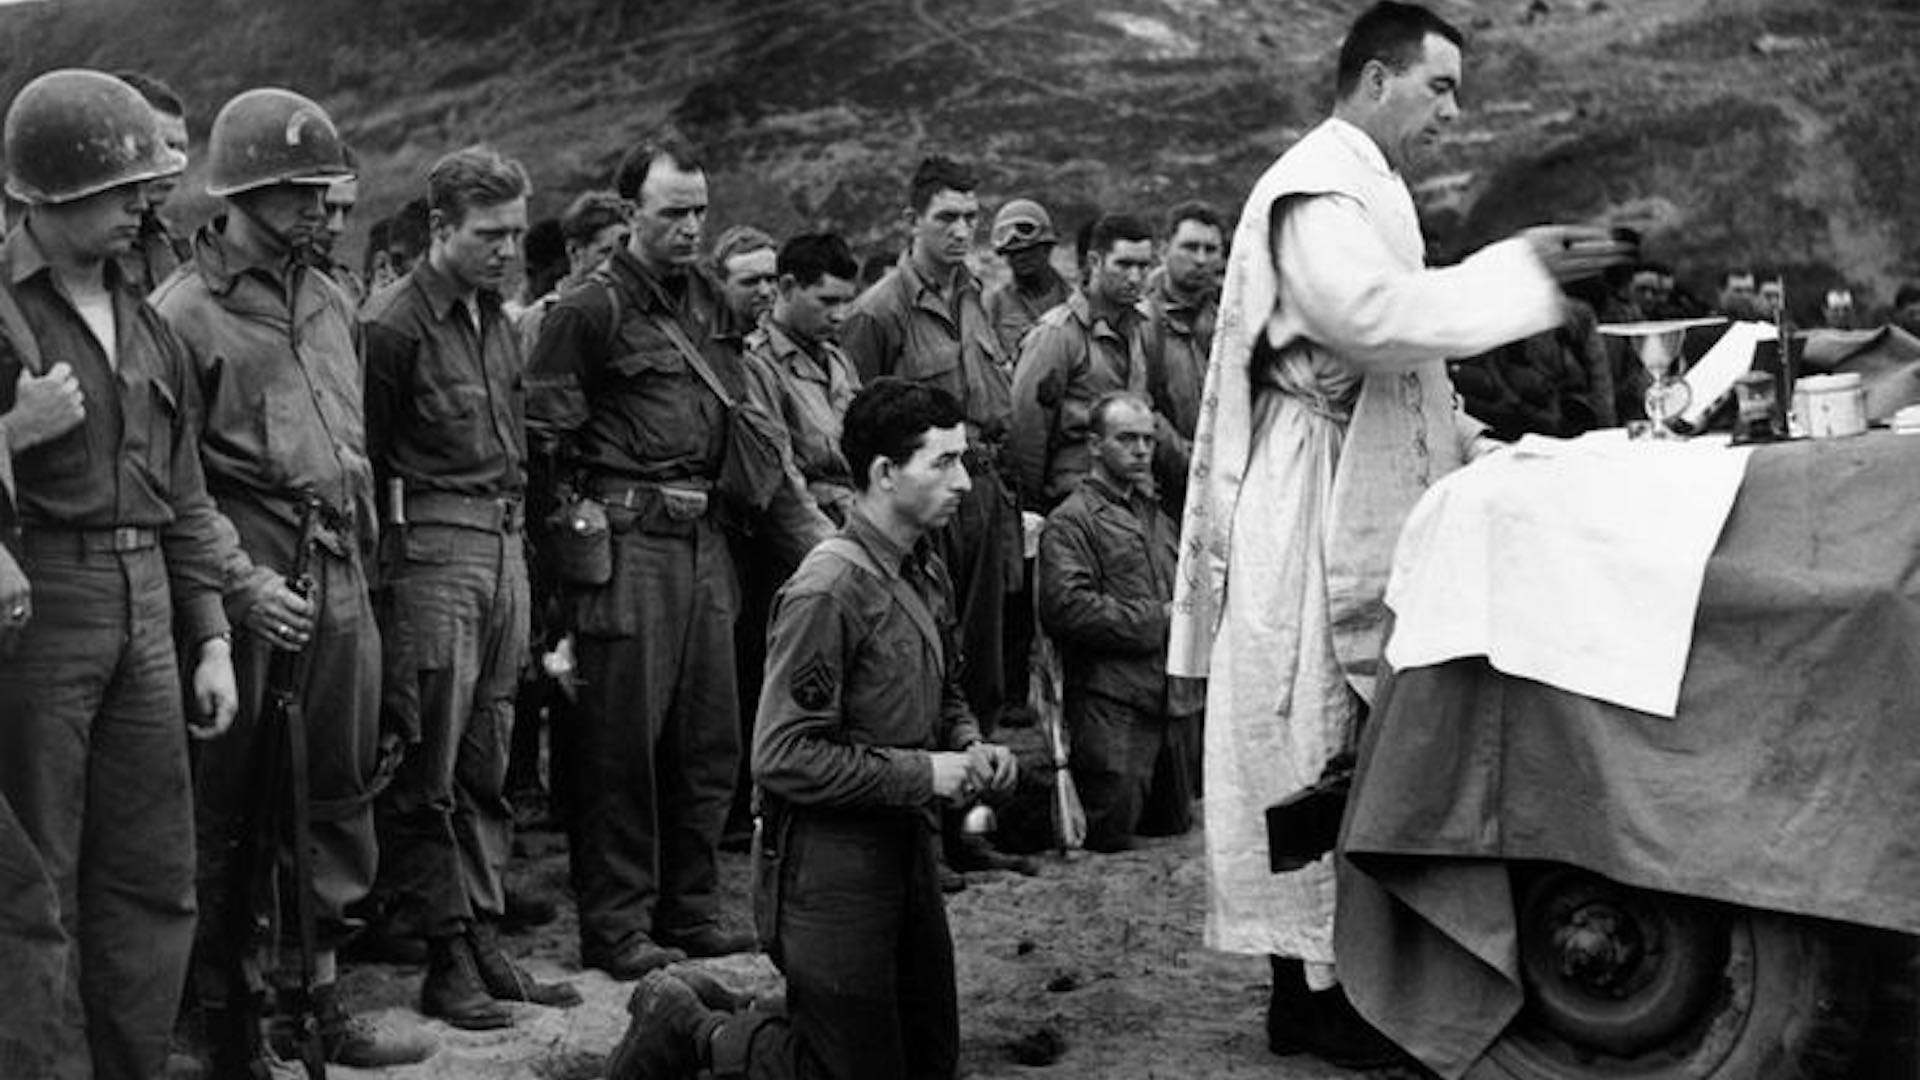 Father Francis Sampson